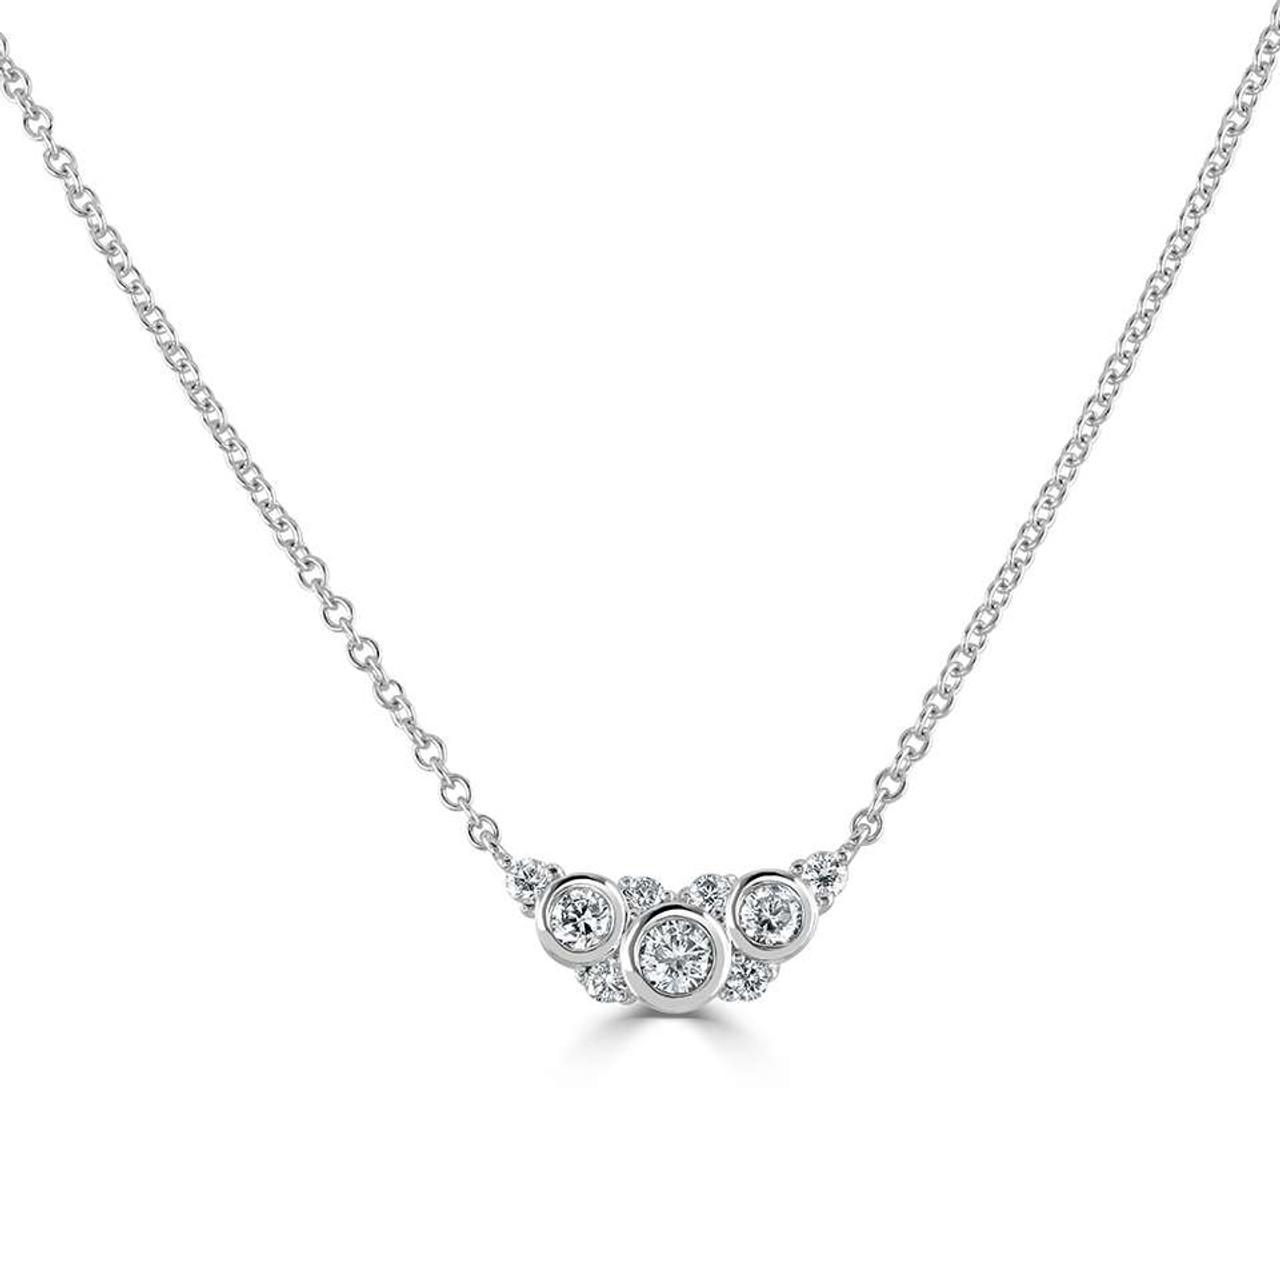 18ct White Gold Diamond Bouquet Necklace